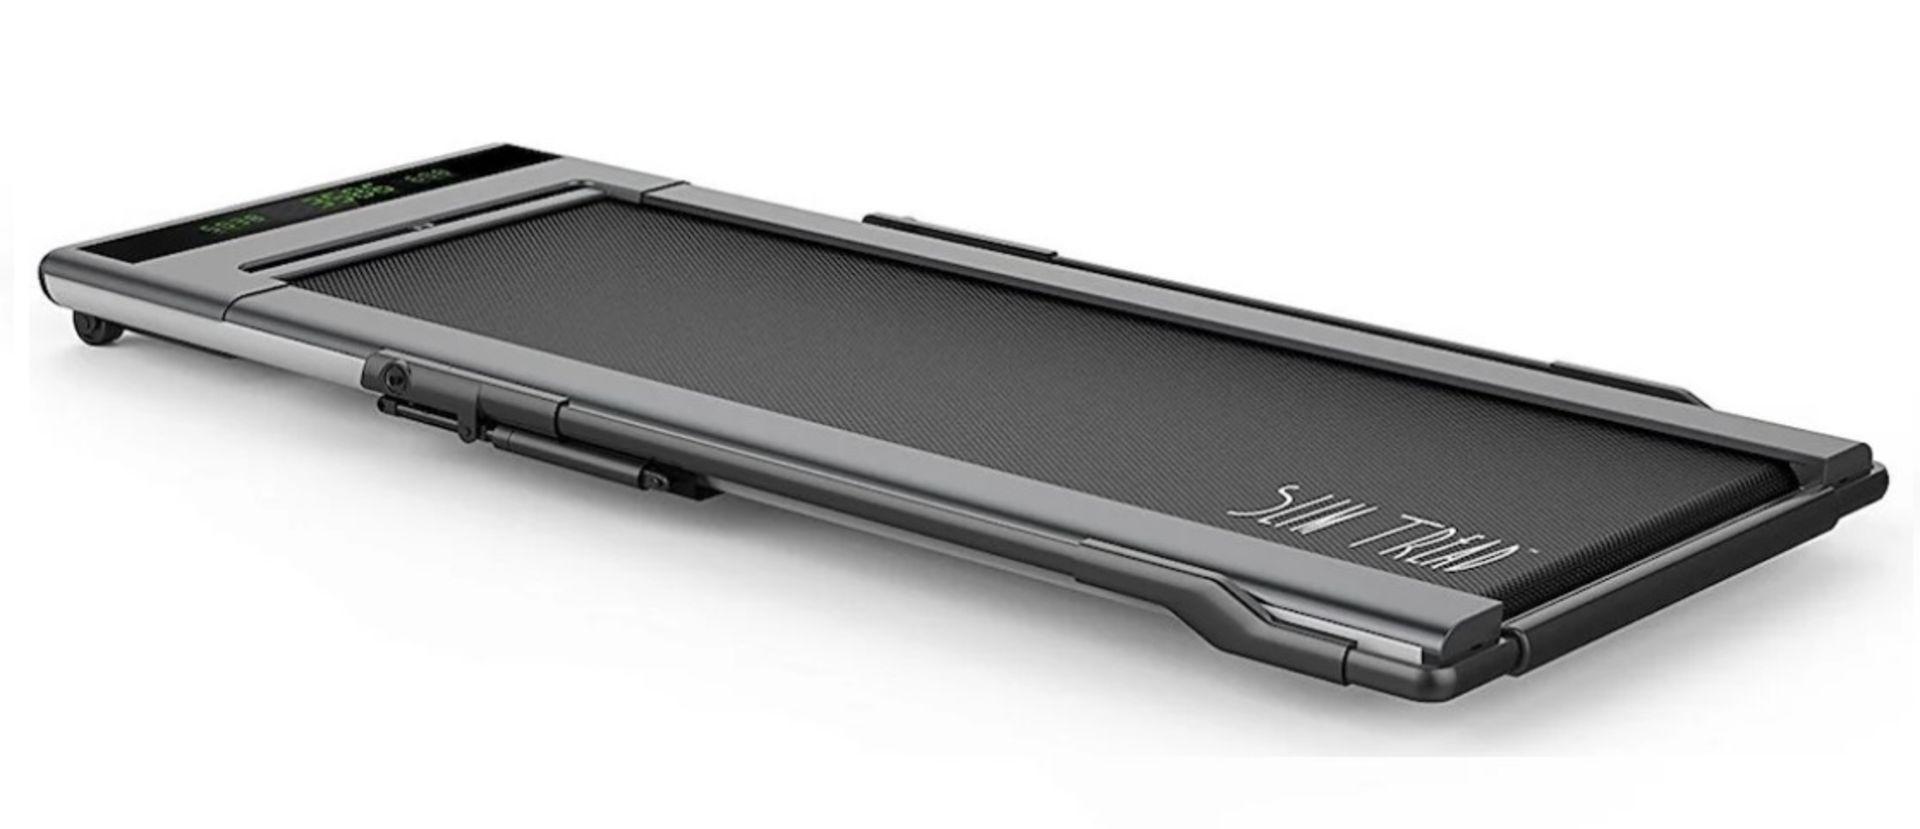 1 x Slim Tread Ultra Thin Smart Treadmill Running / Walking Machine - Lightweight With Folding - Image 7 of 19